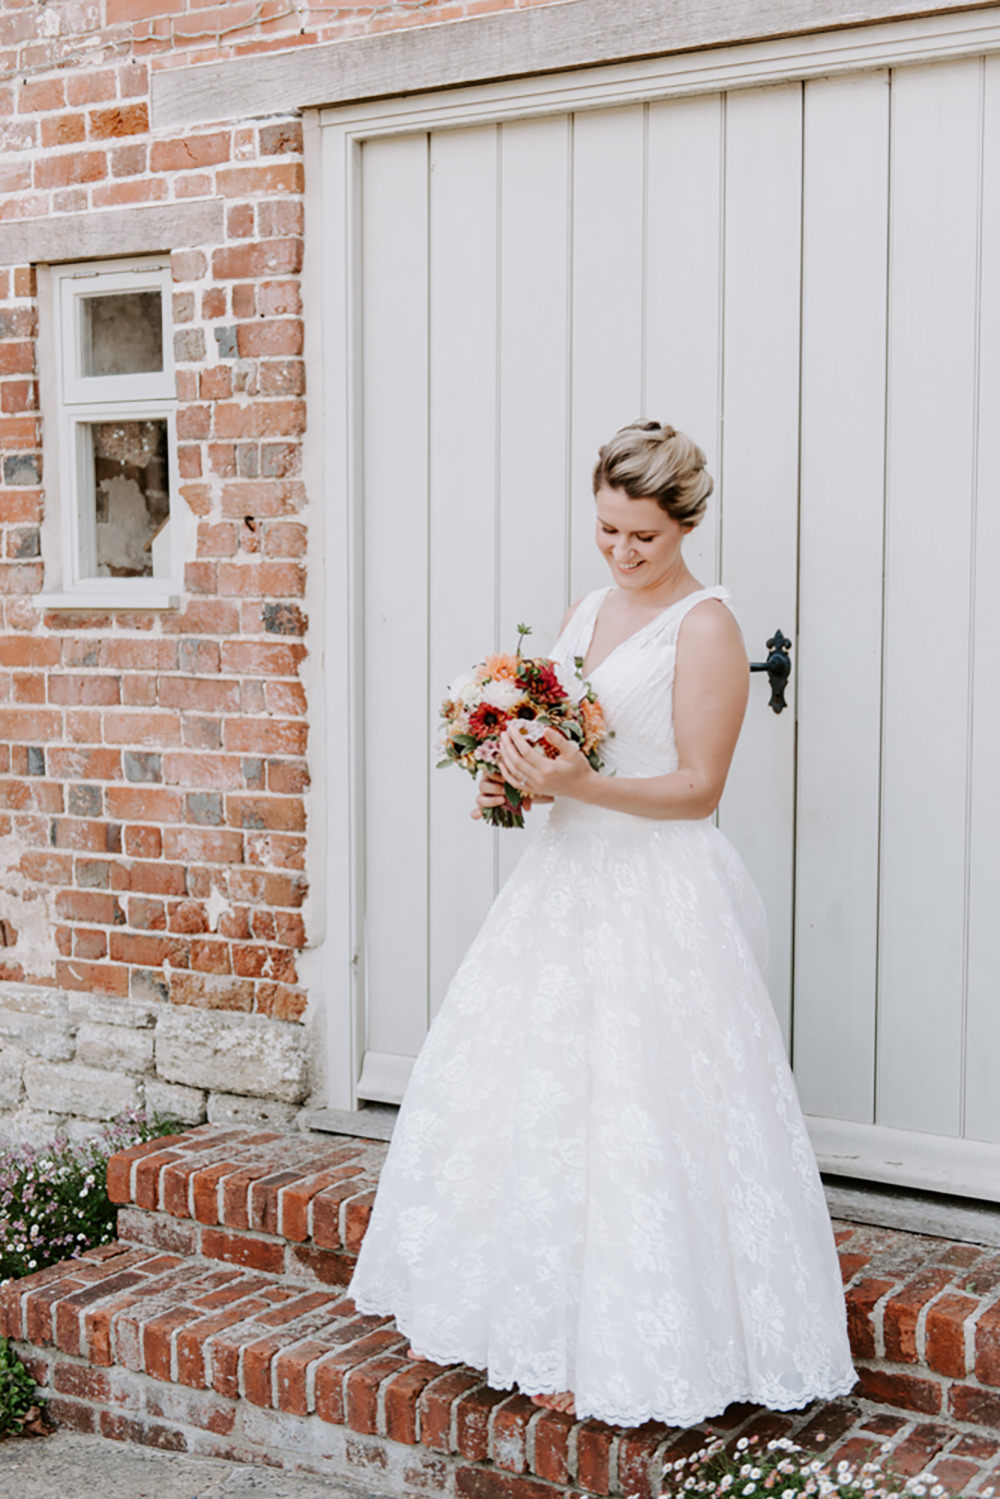 Bride Bridal Dress Gown Lace Straps Ethical Wedding Ideas Sadie Osborne Photography